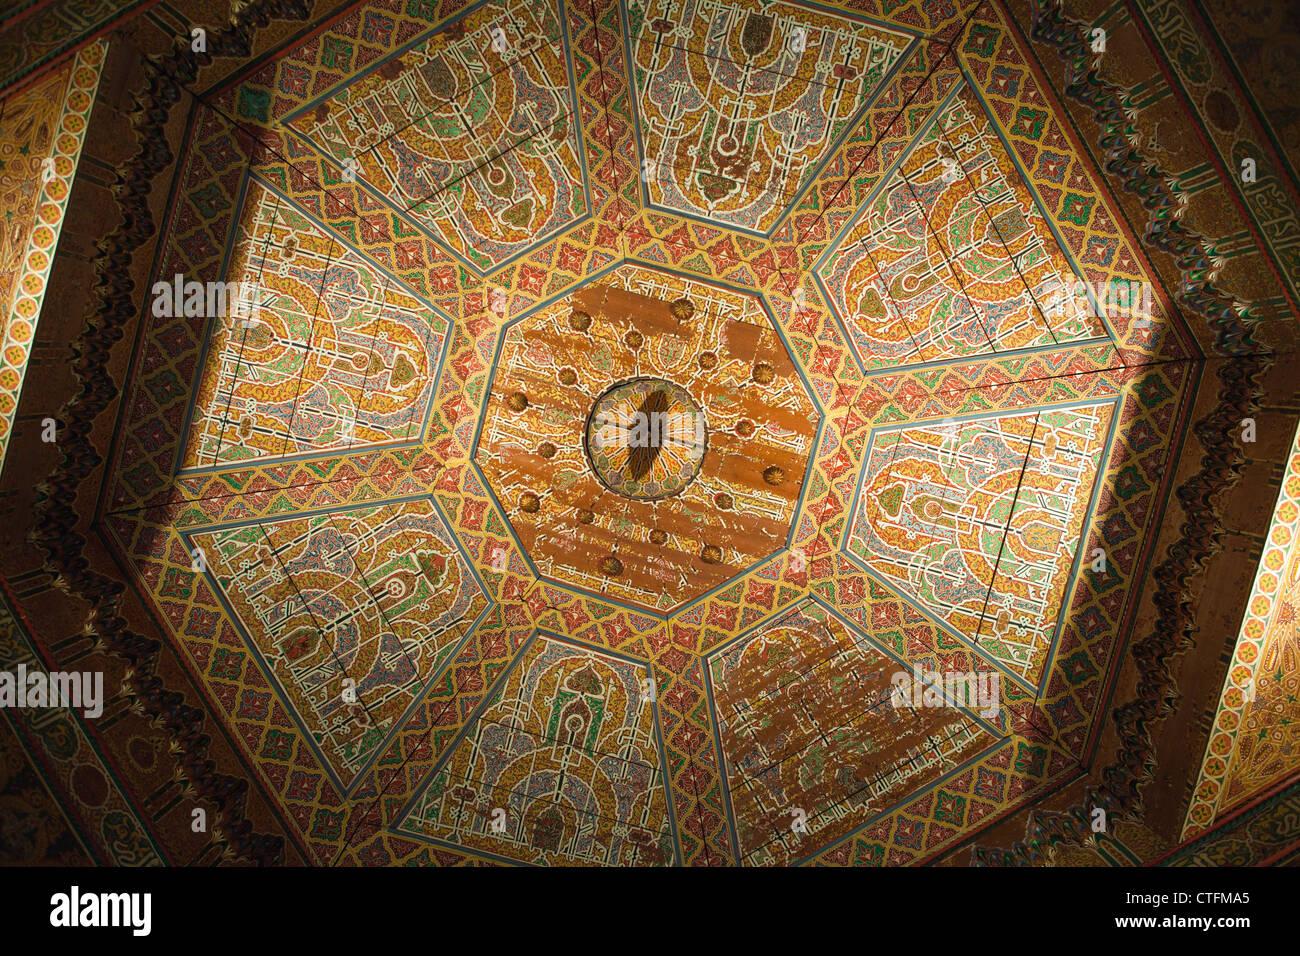 Morocco, Marrakech Bahia palace. - Stock Image